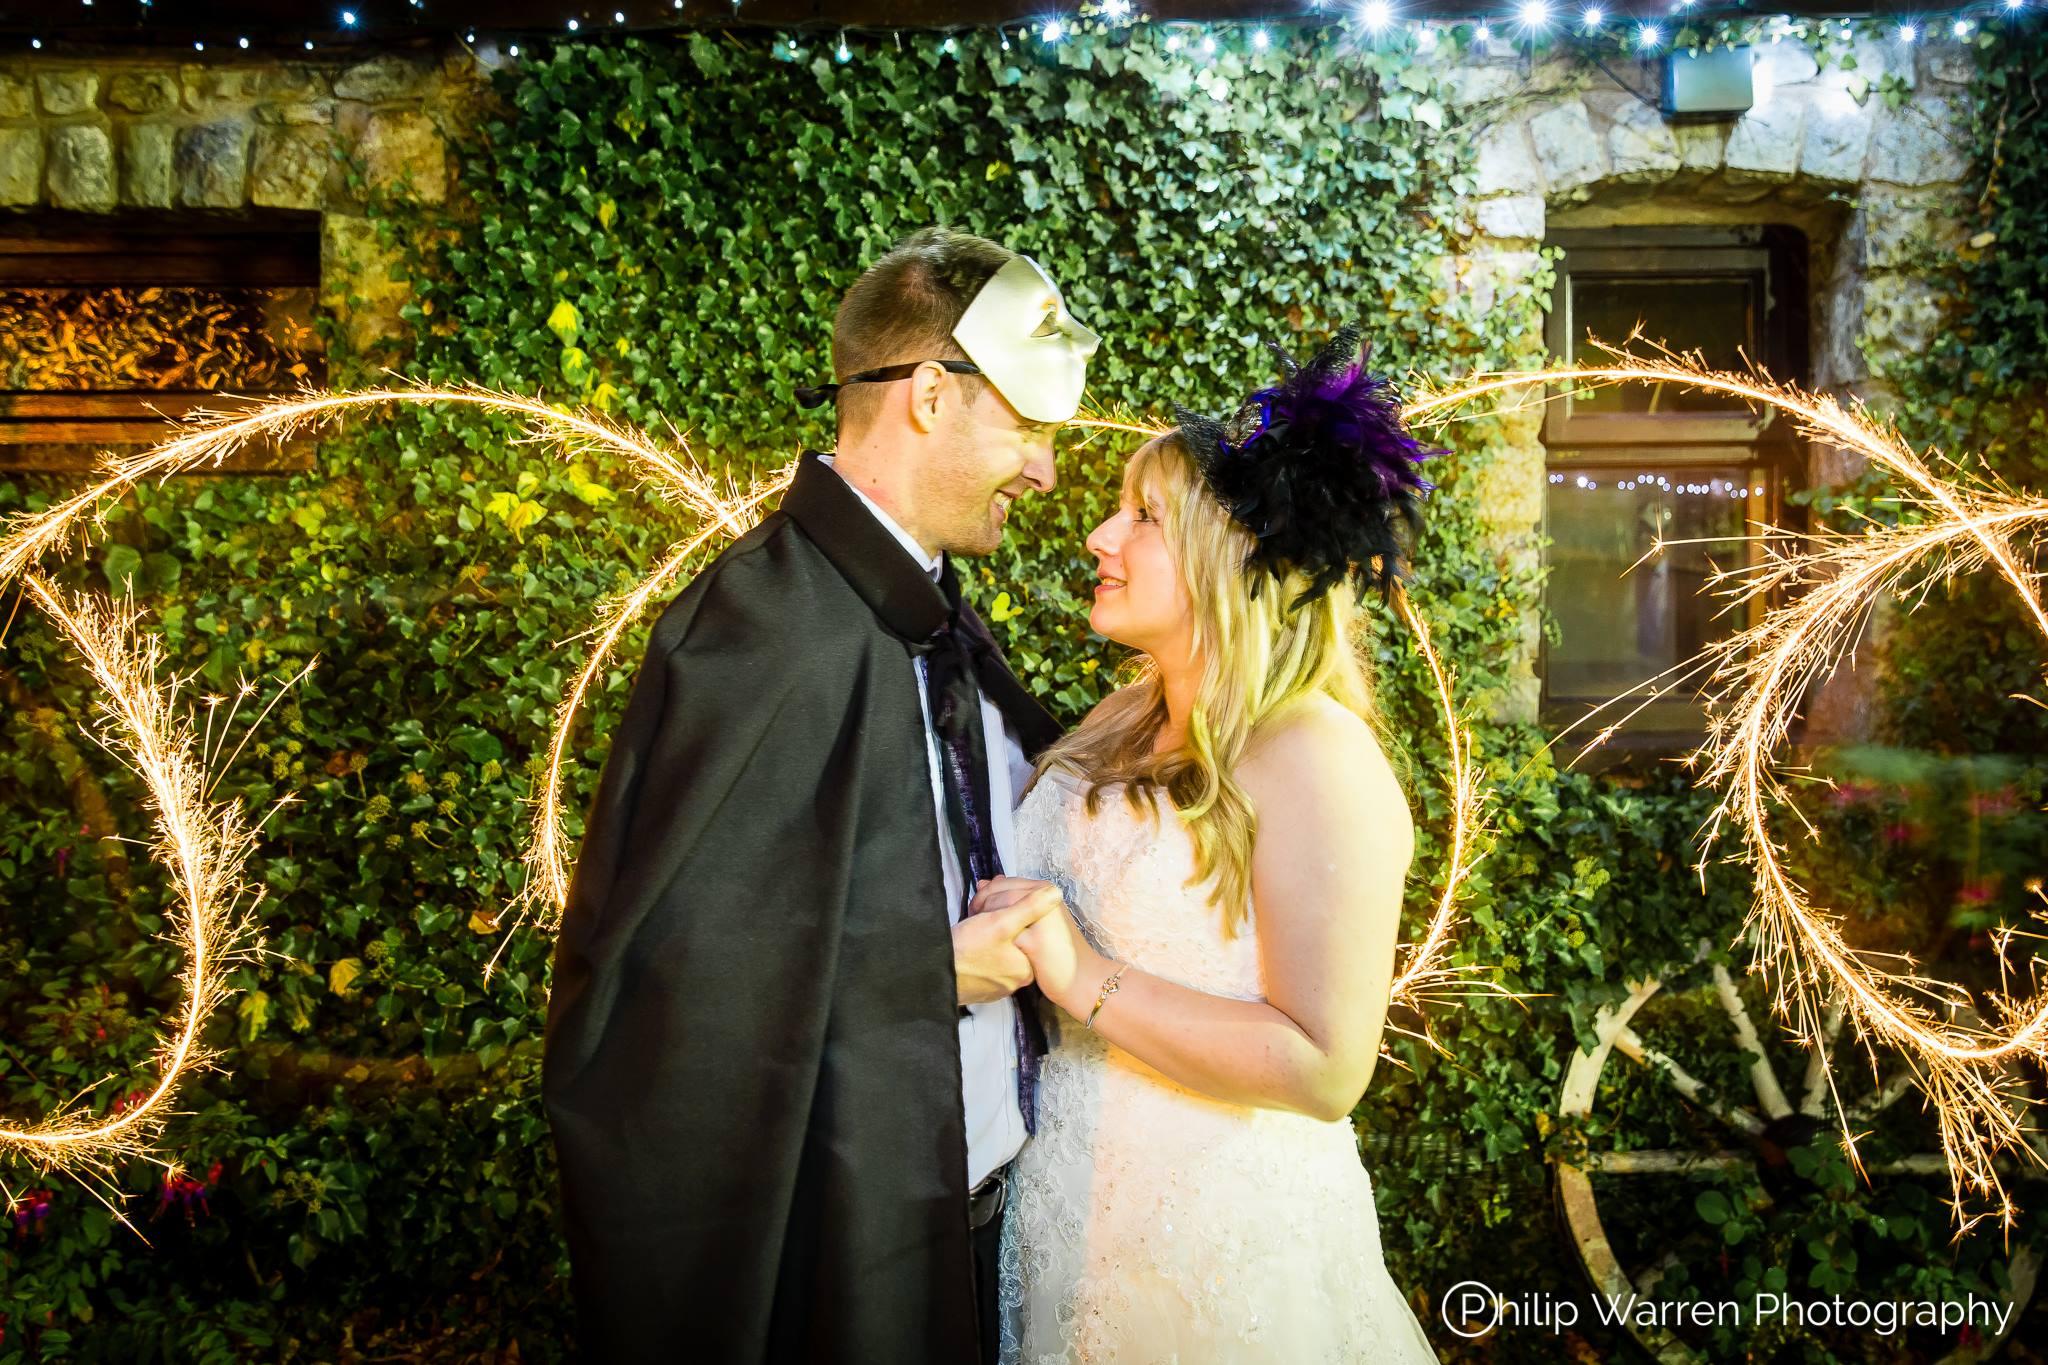 Night Wedding Photo Sparklers